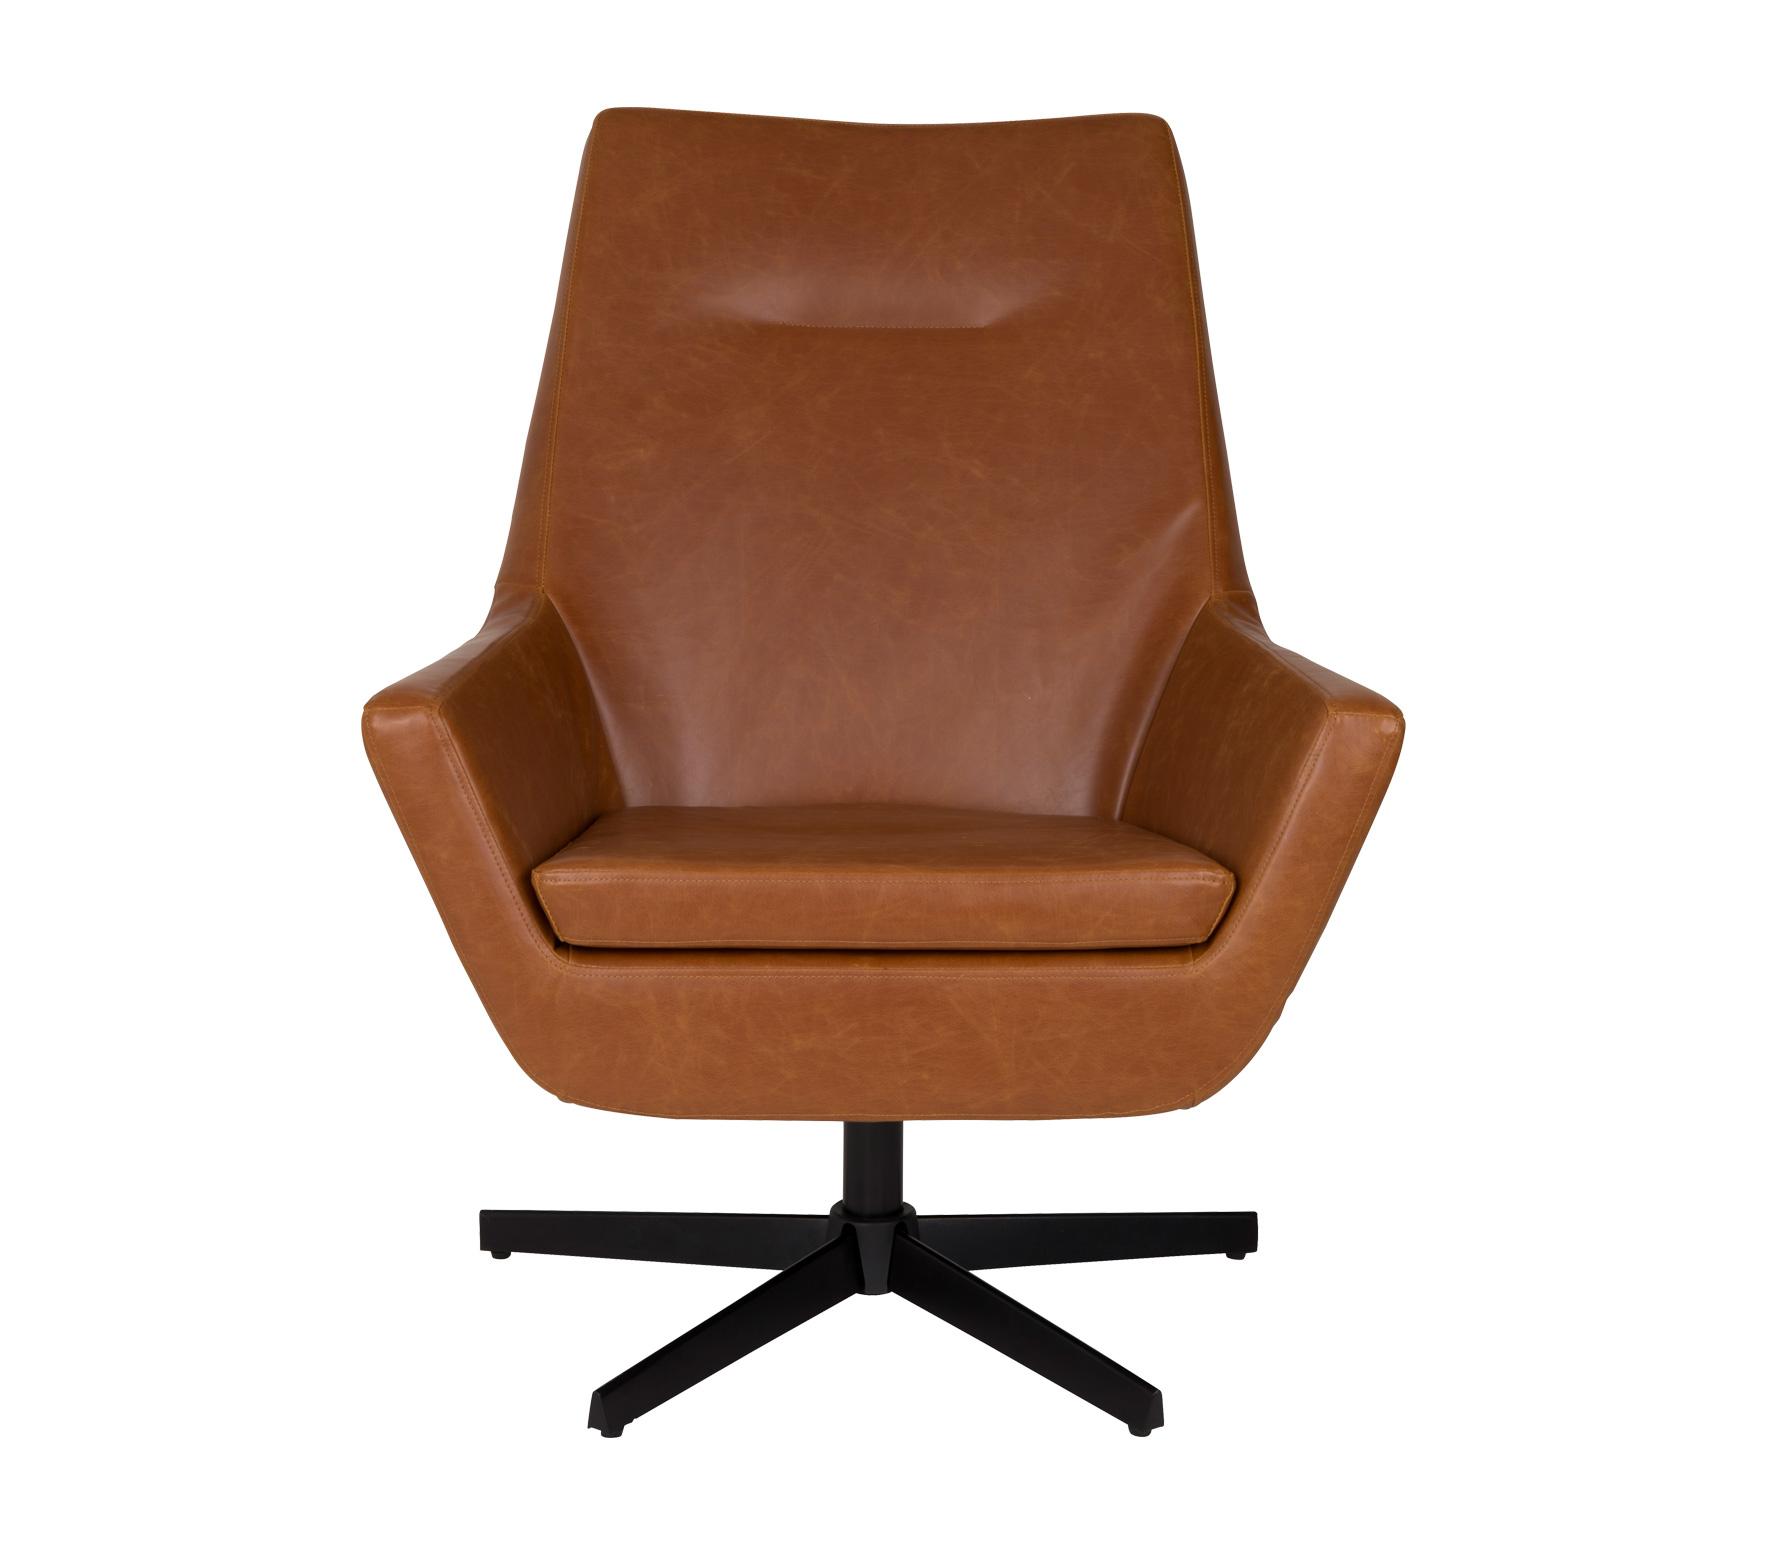 Dutchbone Don Cognac fauteuil lounge draai Cognac AllesWonen